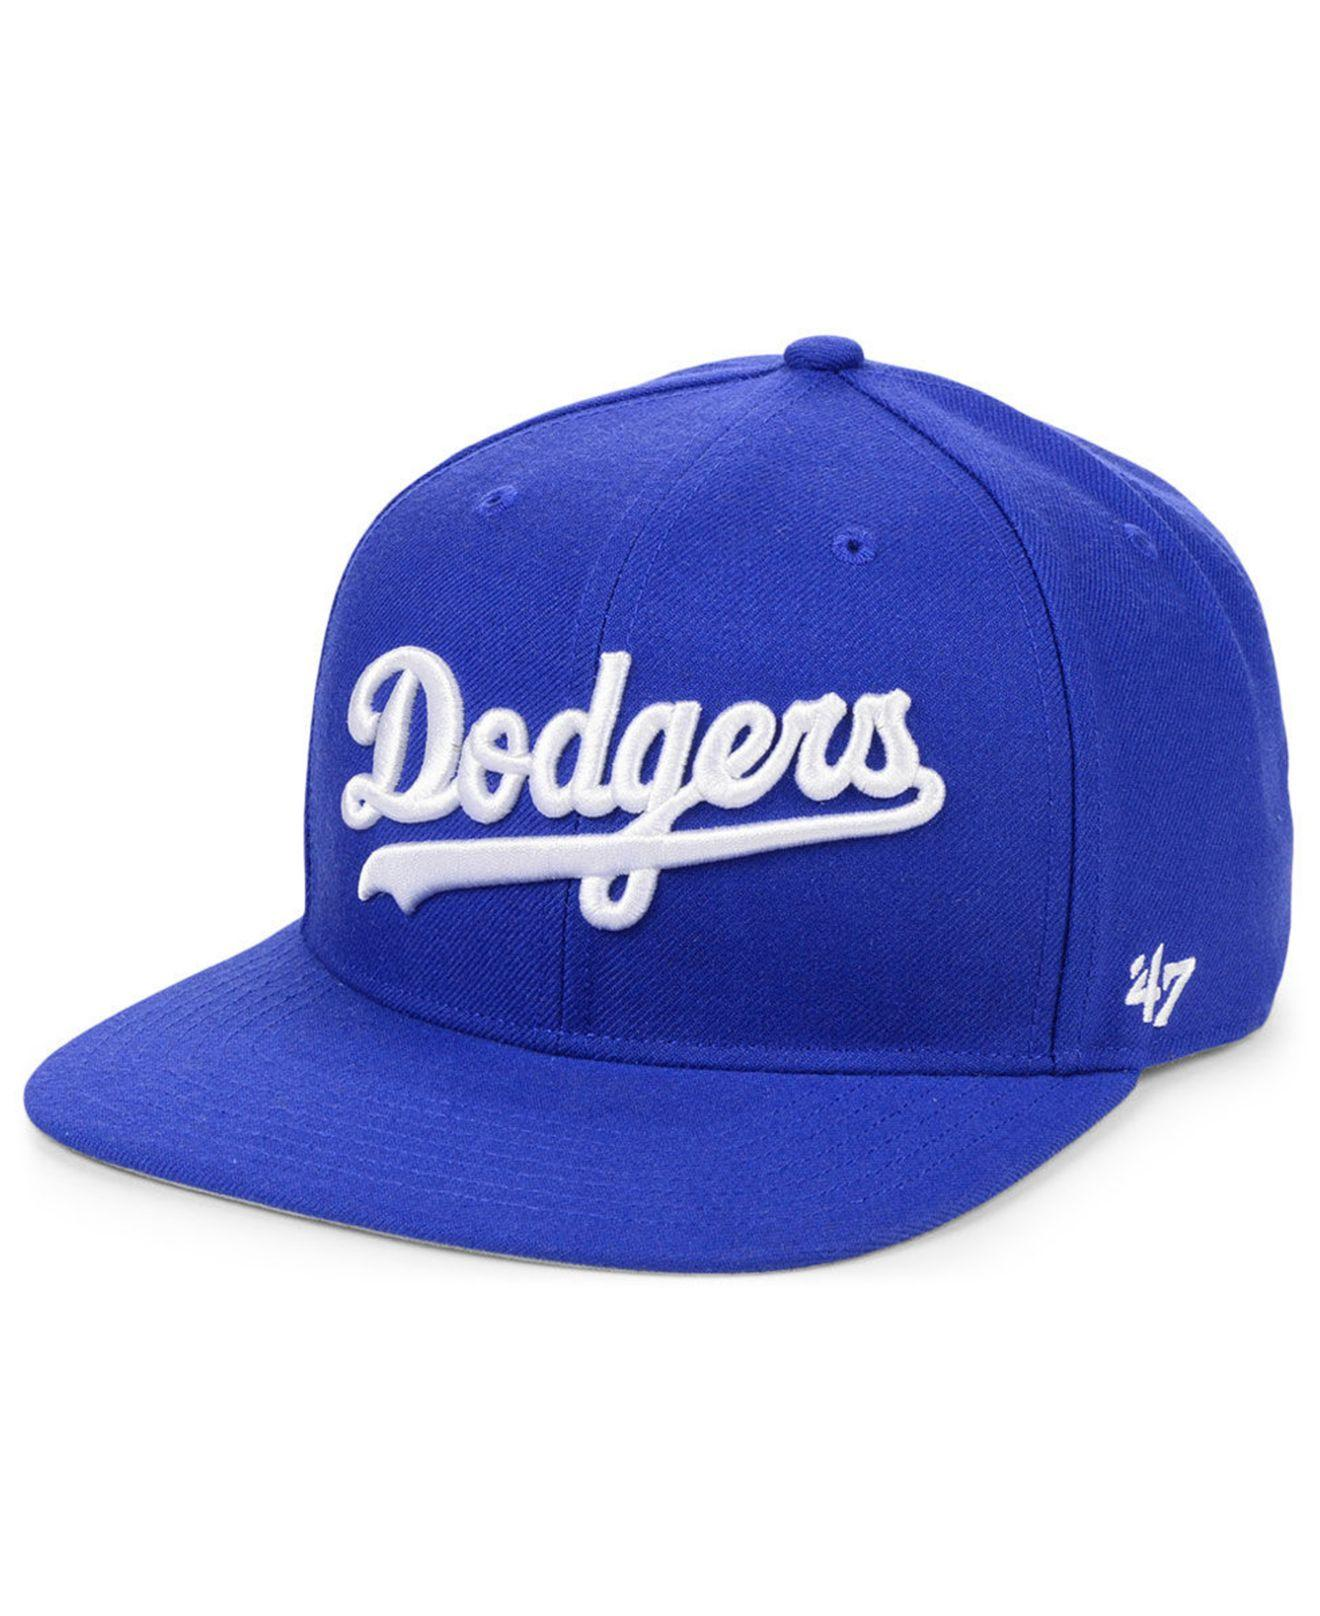 quality design a94aa 95849 47 Brand. Men s Blue Los Angeles Dodgers Script Snapback Cap